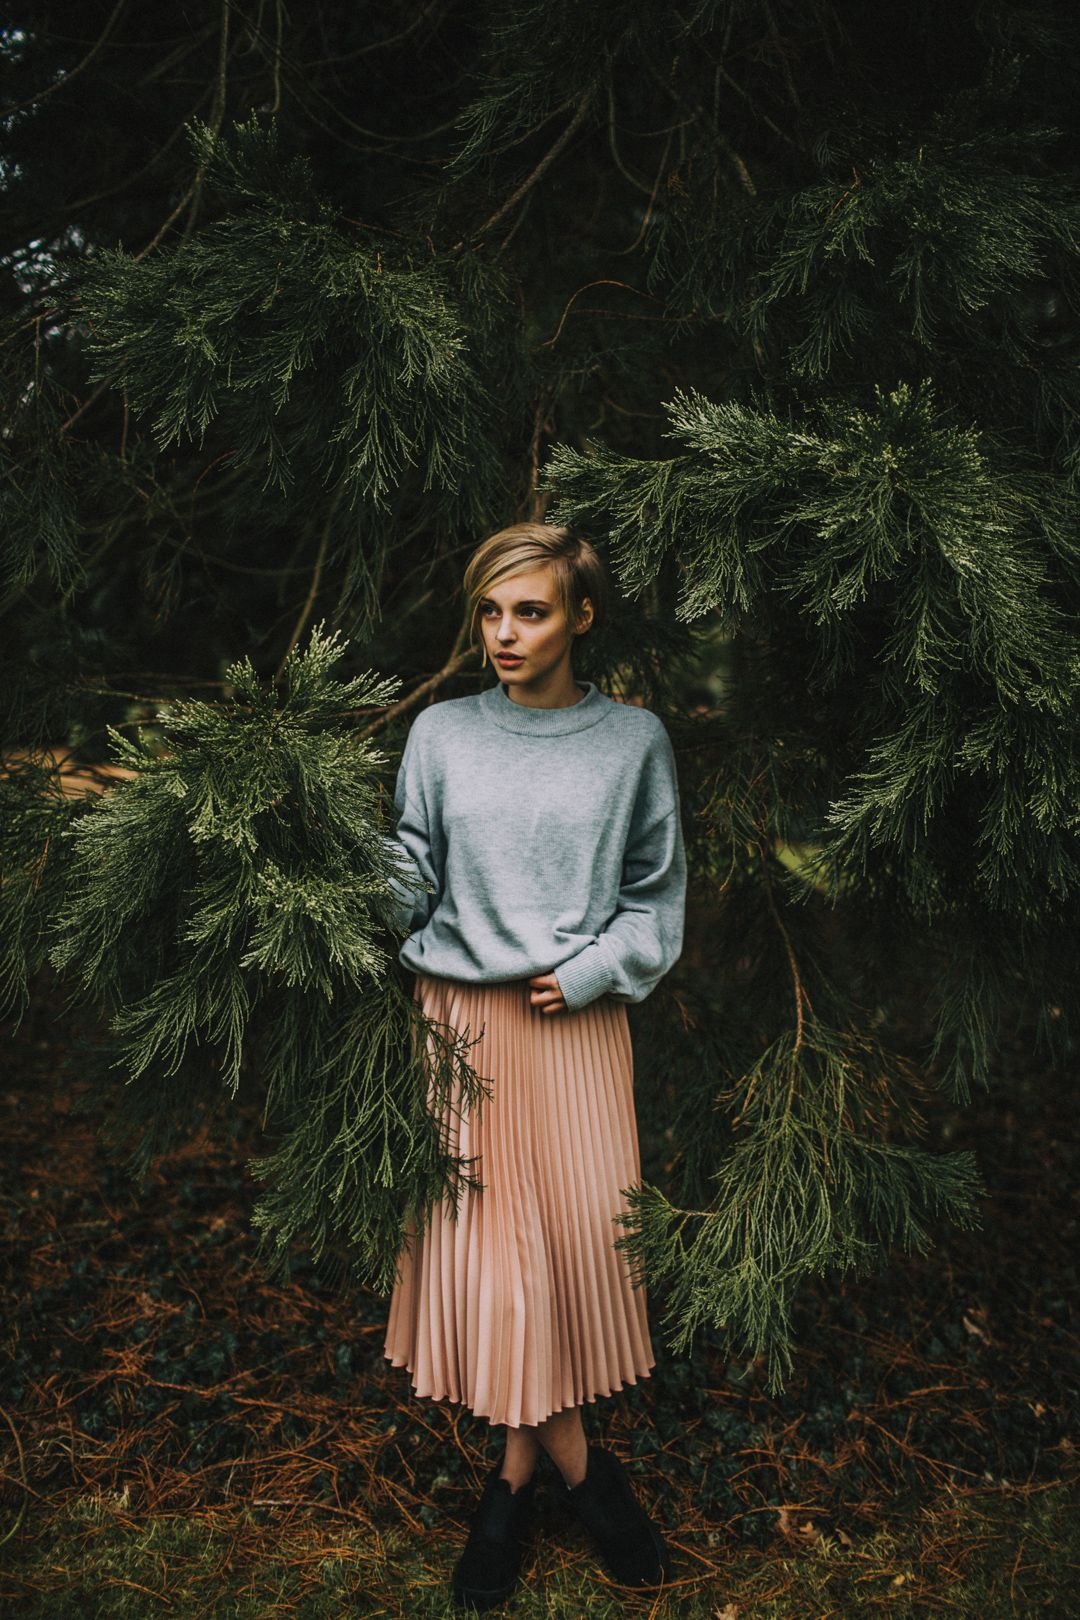 nature portrait fashion editorial woman beauty featured lookslikefilm #editorialfashion